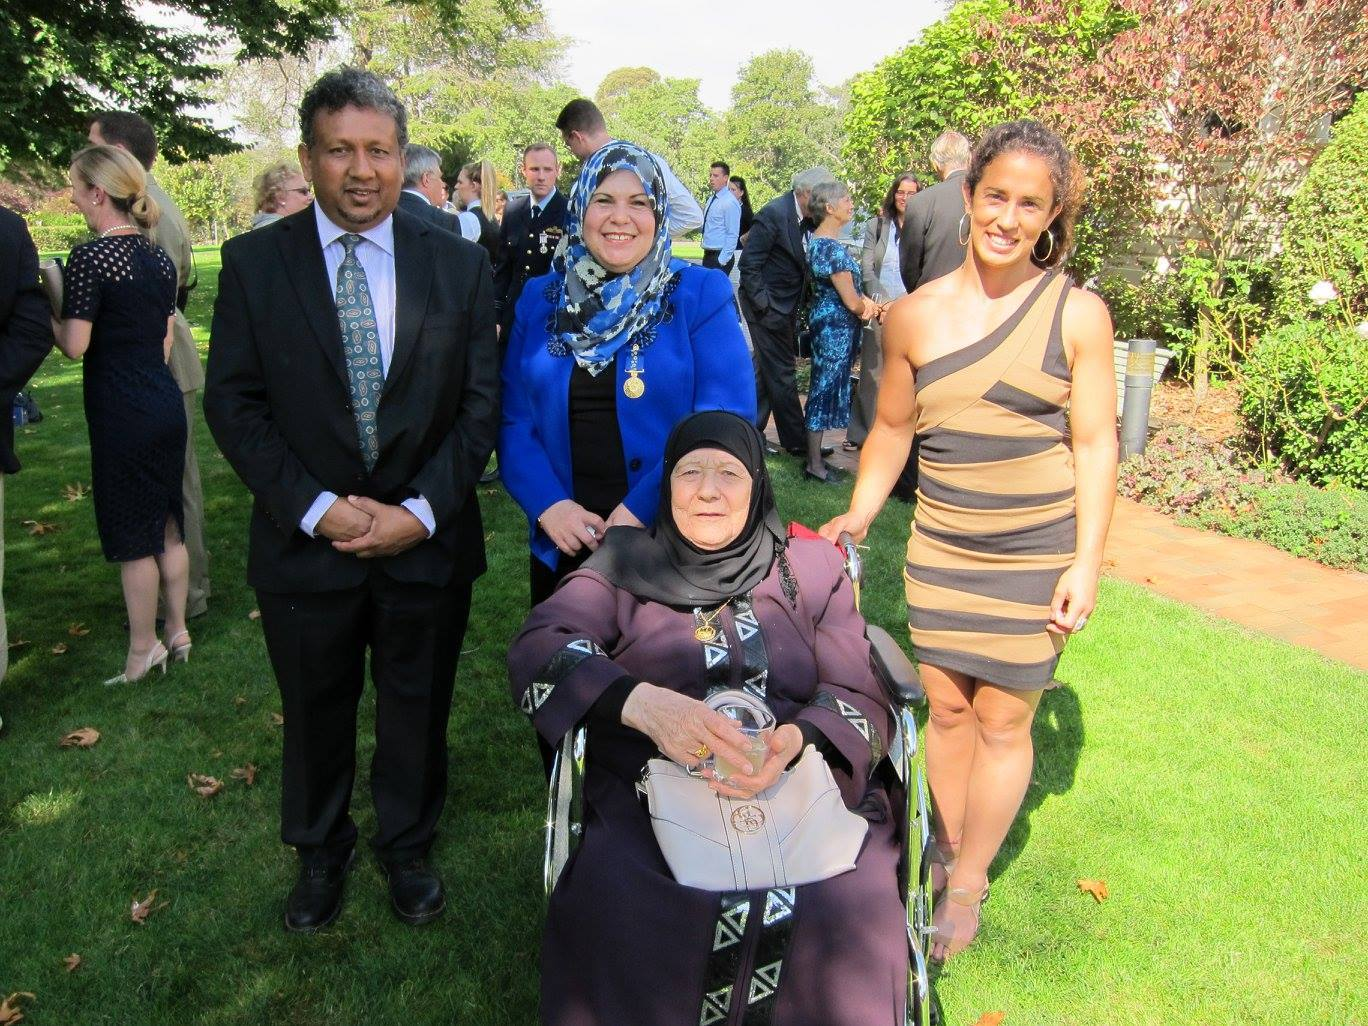 Bianca's mum, Diana Abdel-Rahman, is awarded the Order of Australia for her tireless community work.